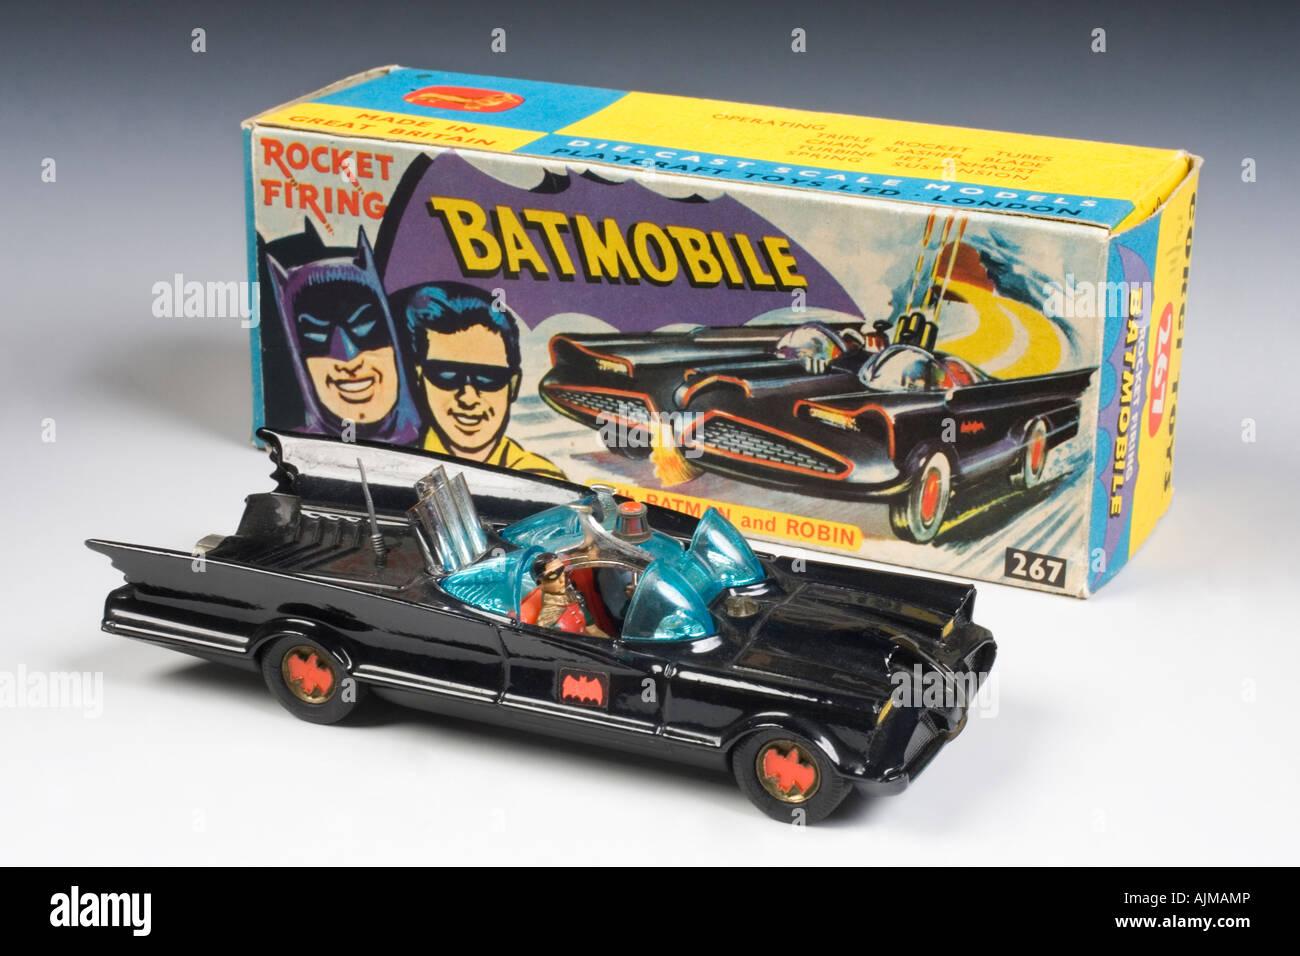 The Batmobile . Corgi Diecast model no.267. Issued 1966-1967 - Stock Image